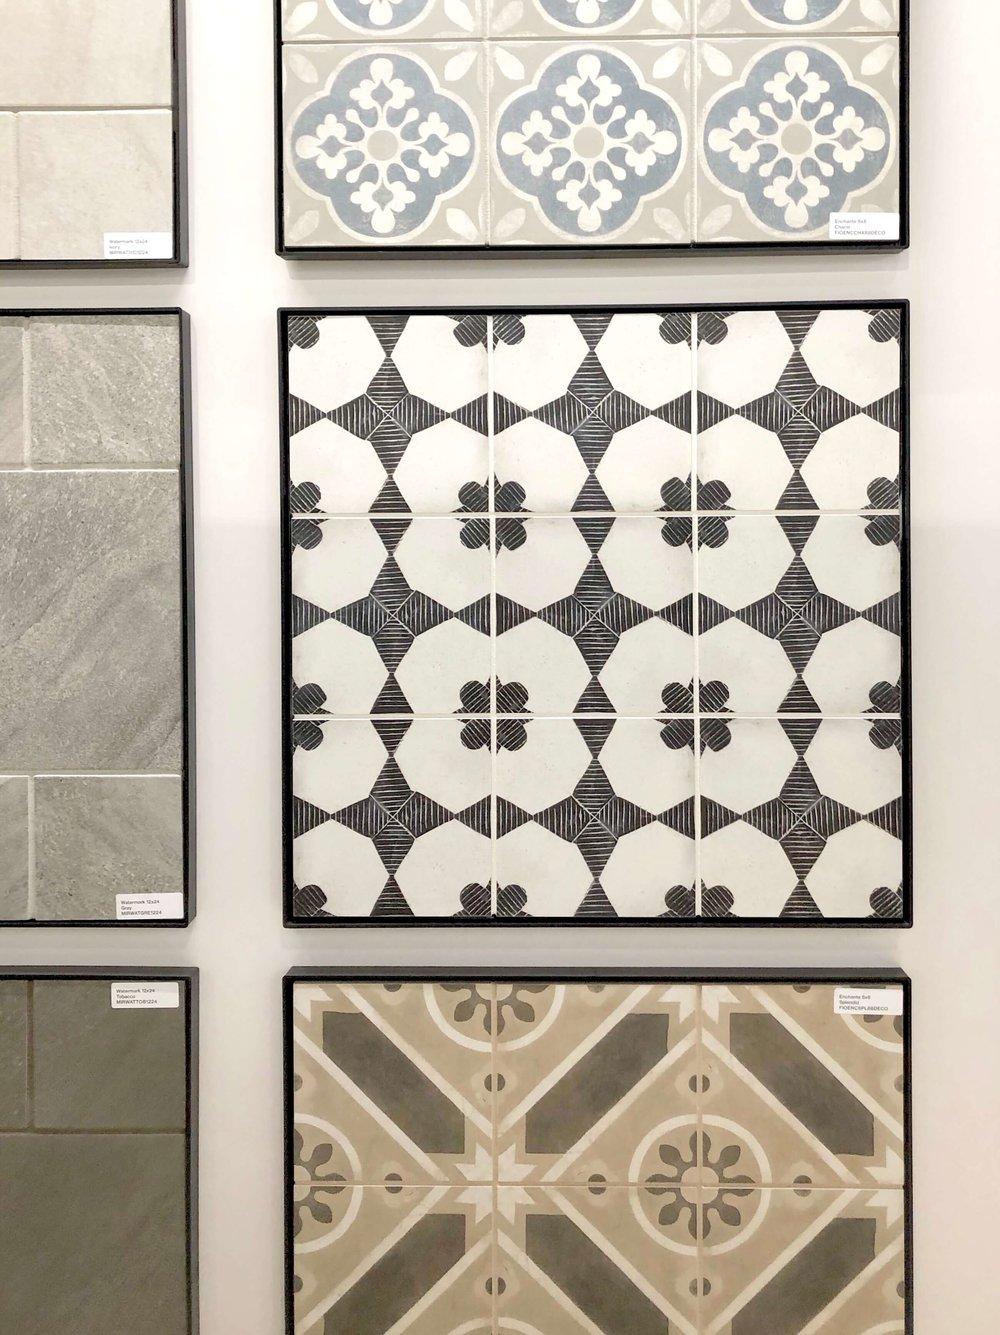 Porcelain cement-look tiles | KBIS 2019 Surfaces Trends